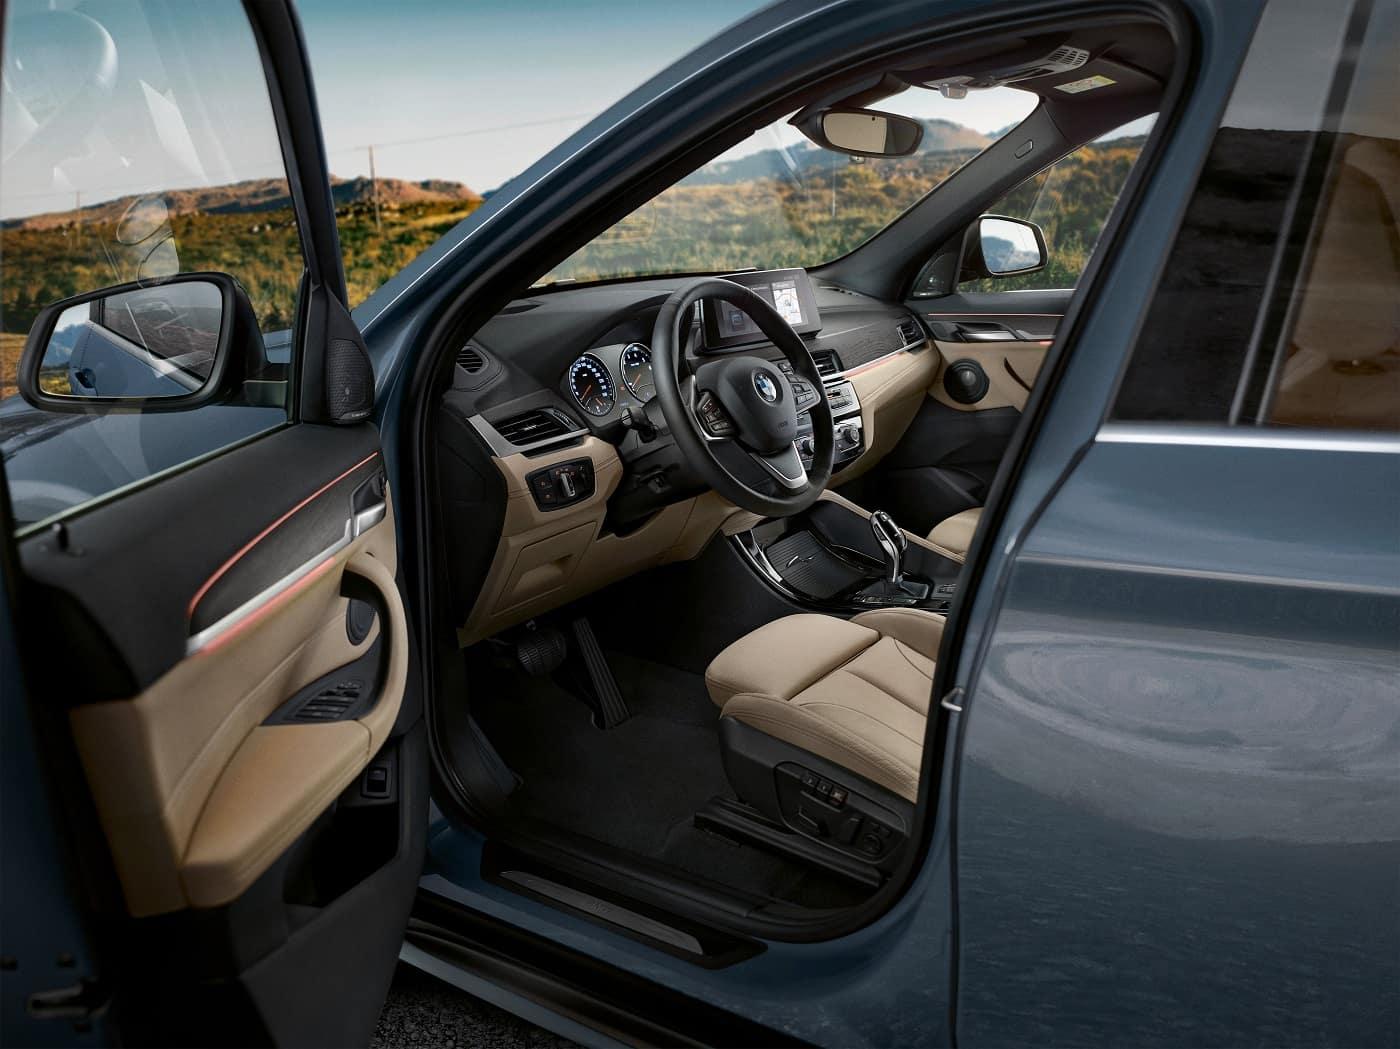 2020 BMW X1 Interior Technology Lancaster PA